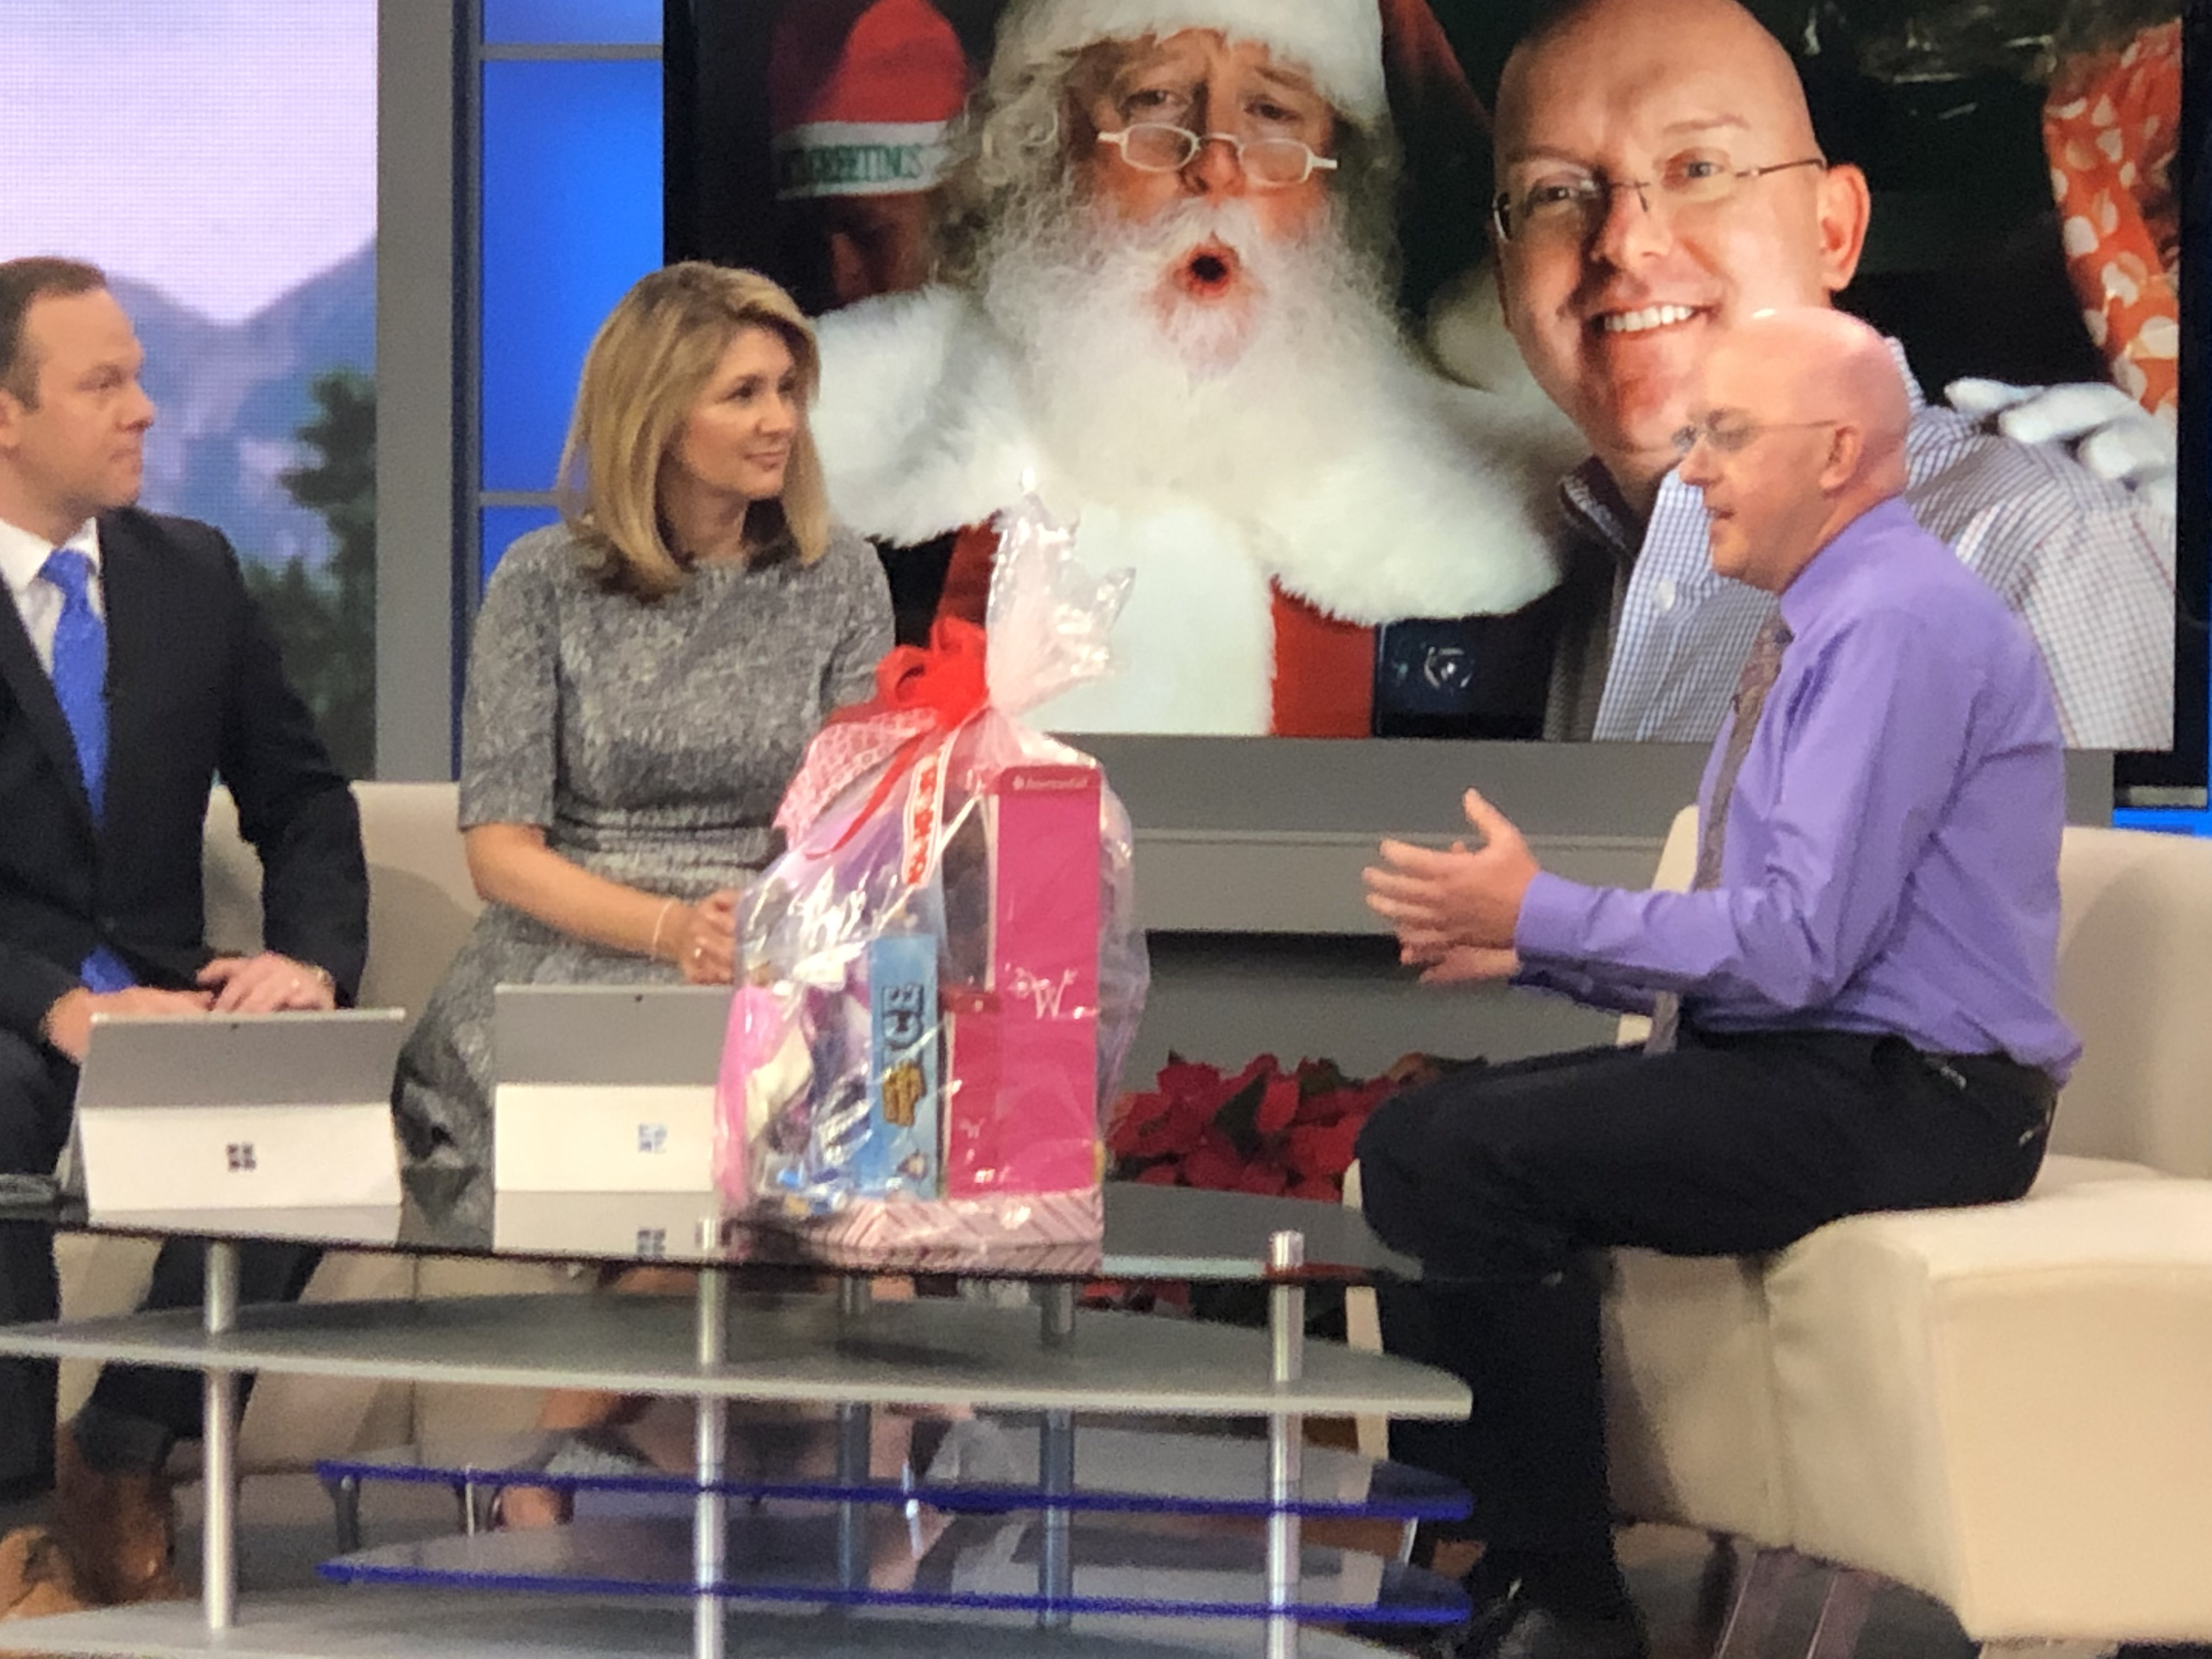 KSL 5 News: Santa Sacks Help Students in Need